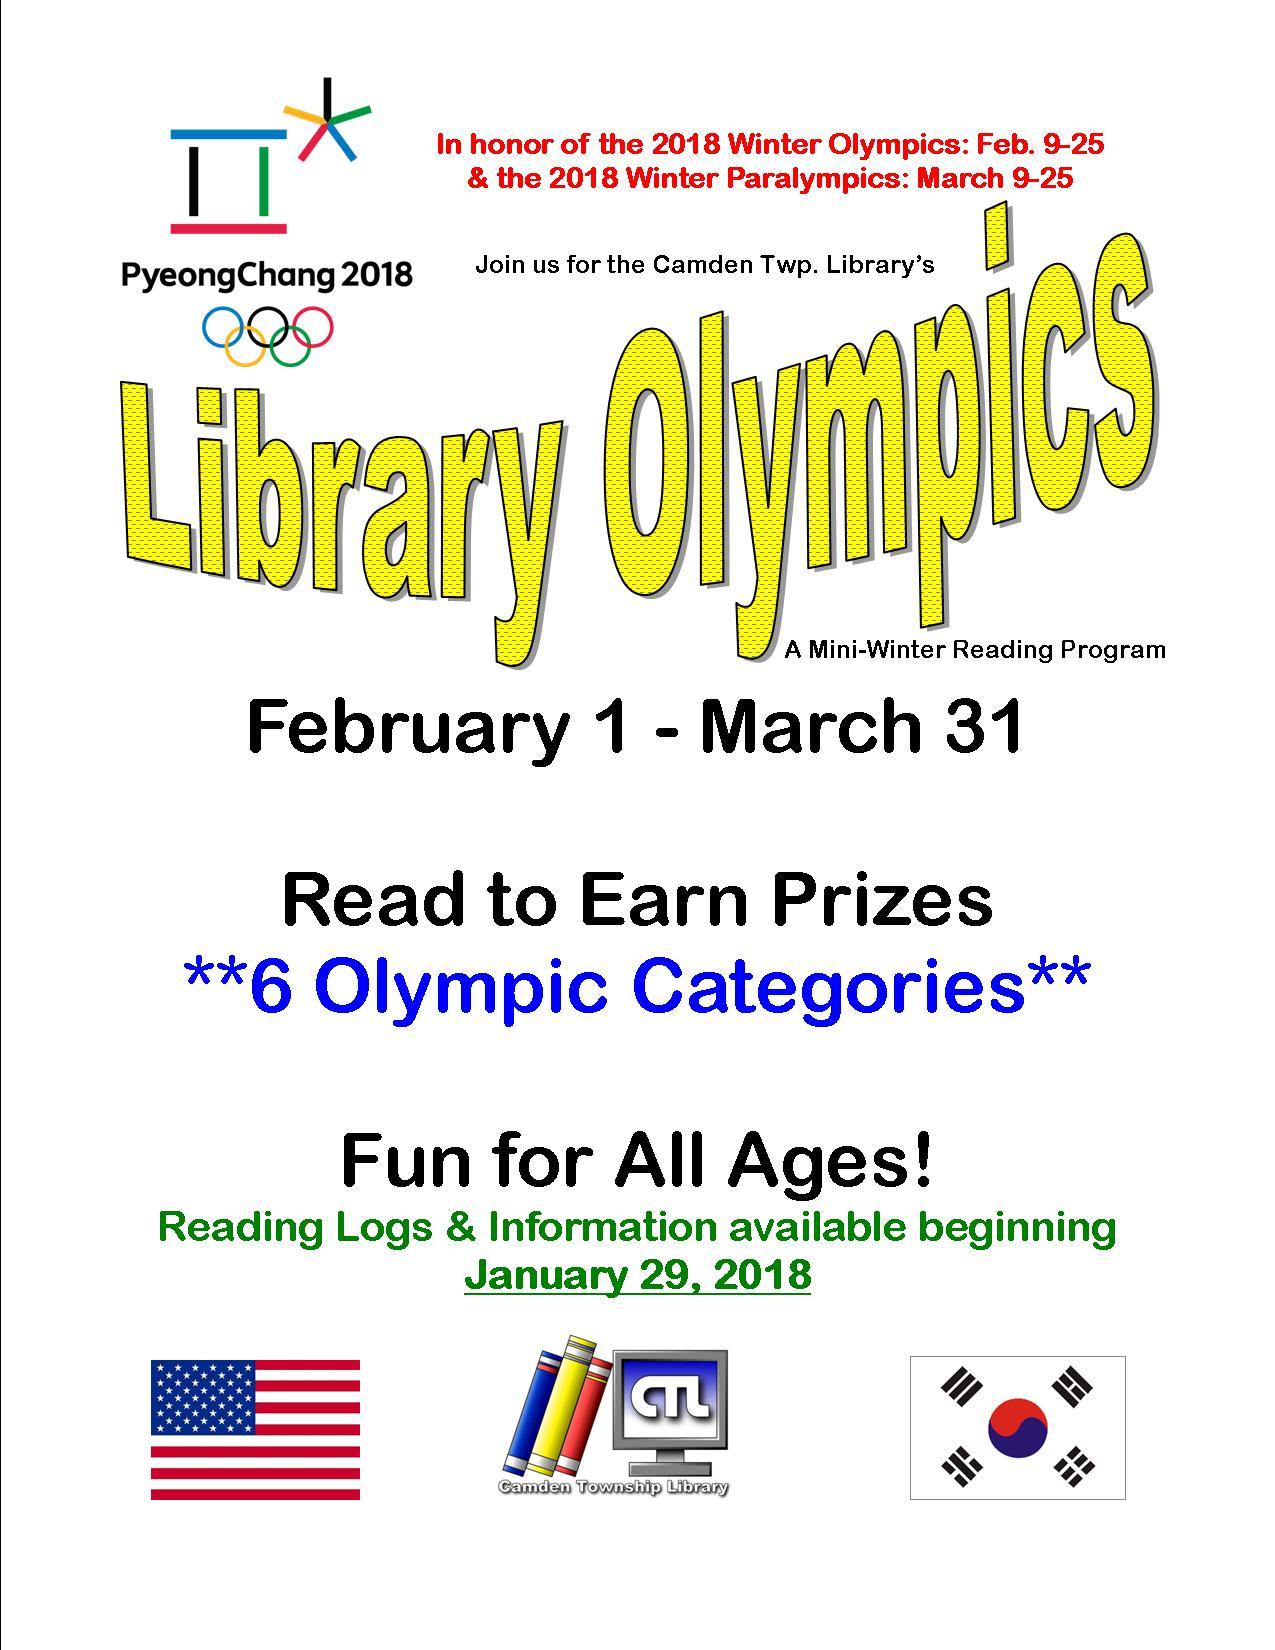 Winter Olympics 2018 mini reading program flyer.jpg